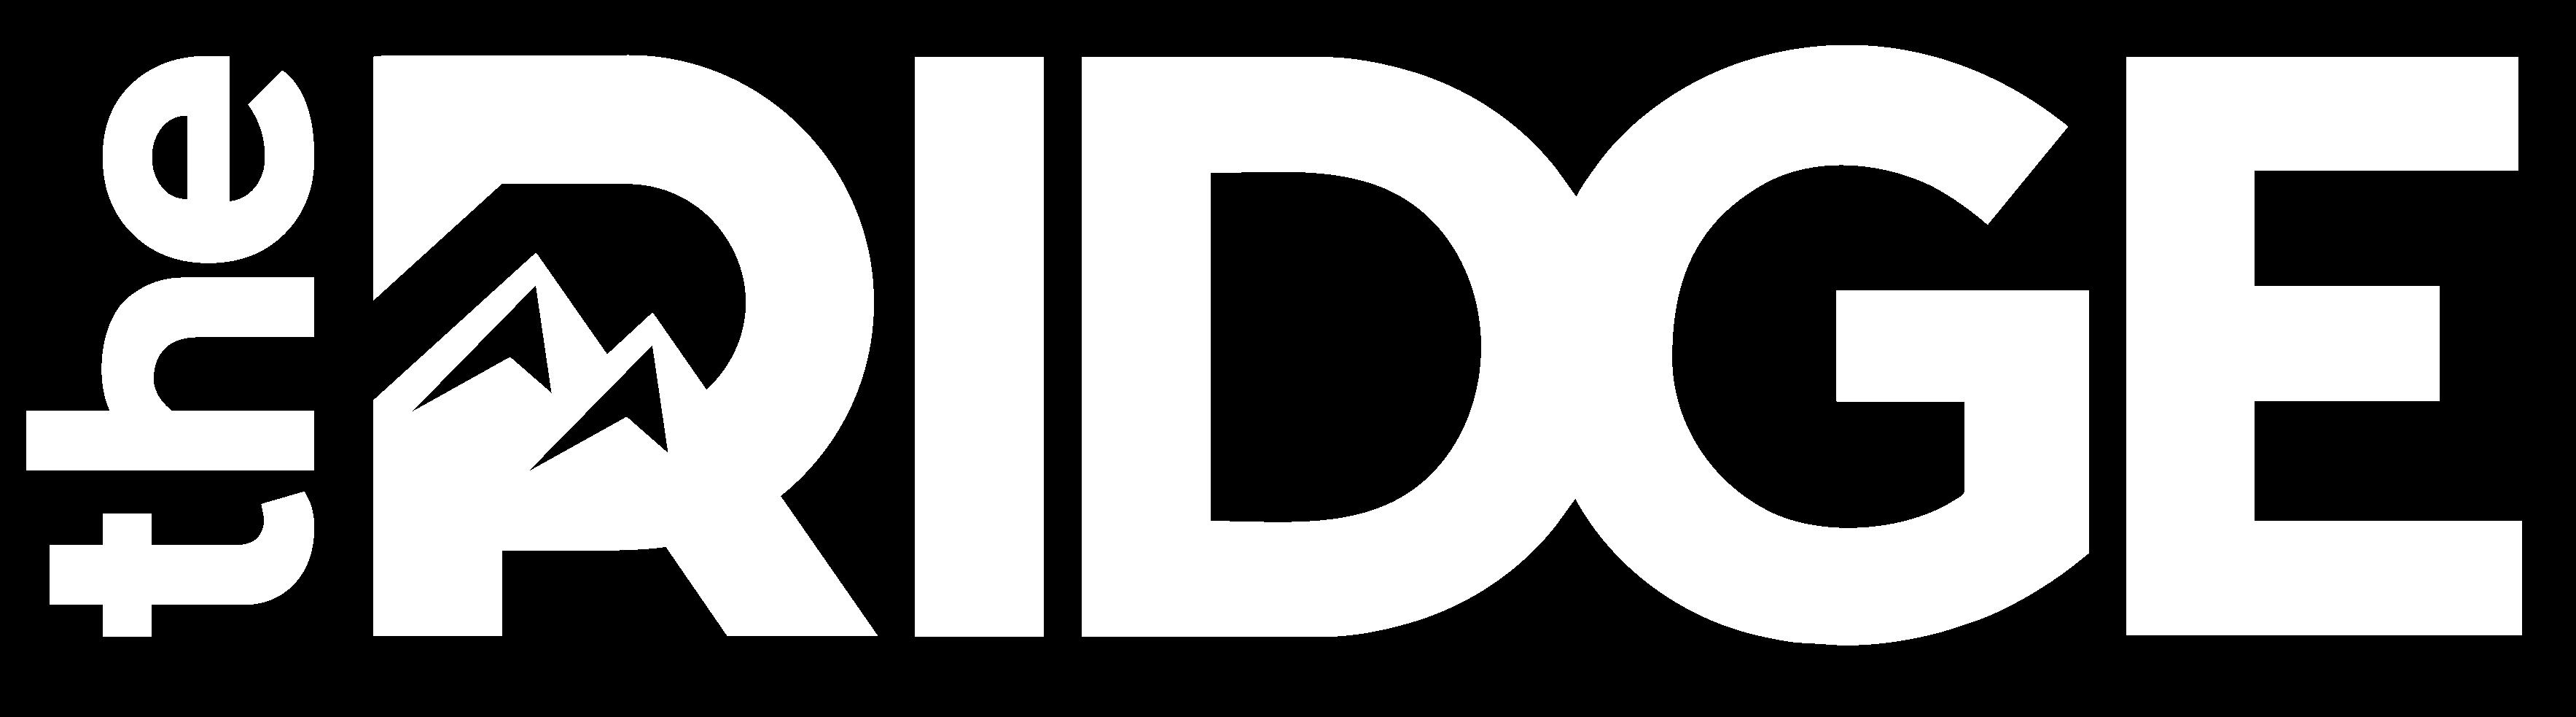 Logo for The Ridge.